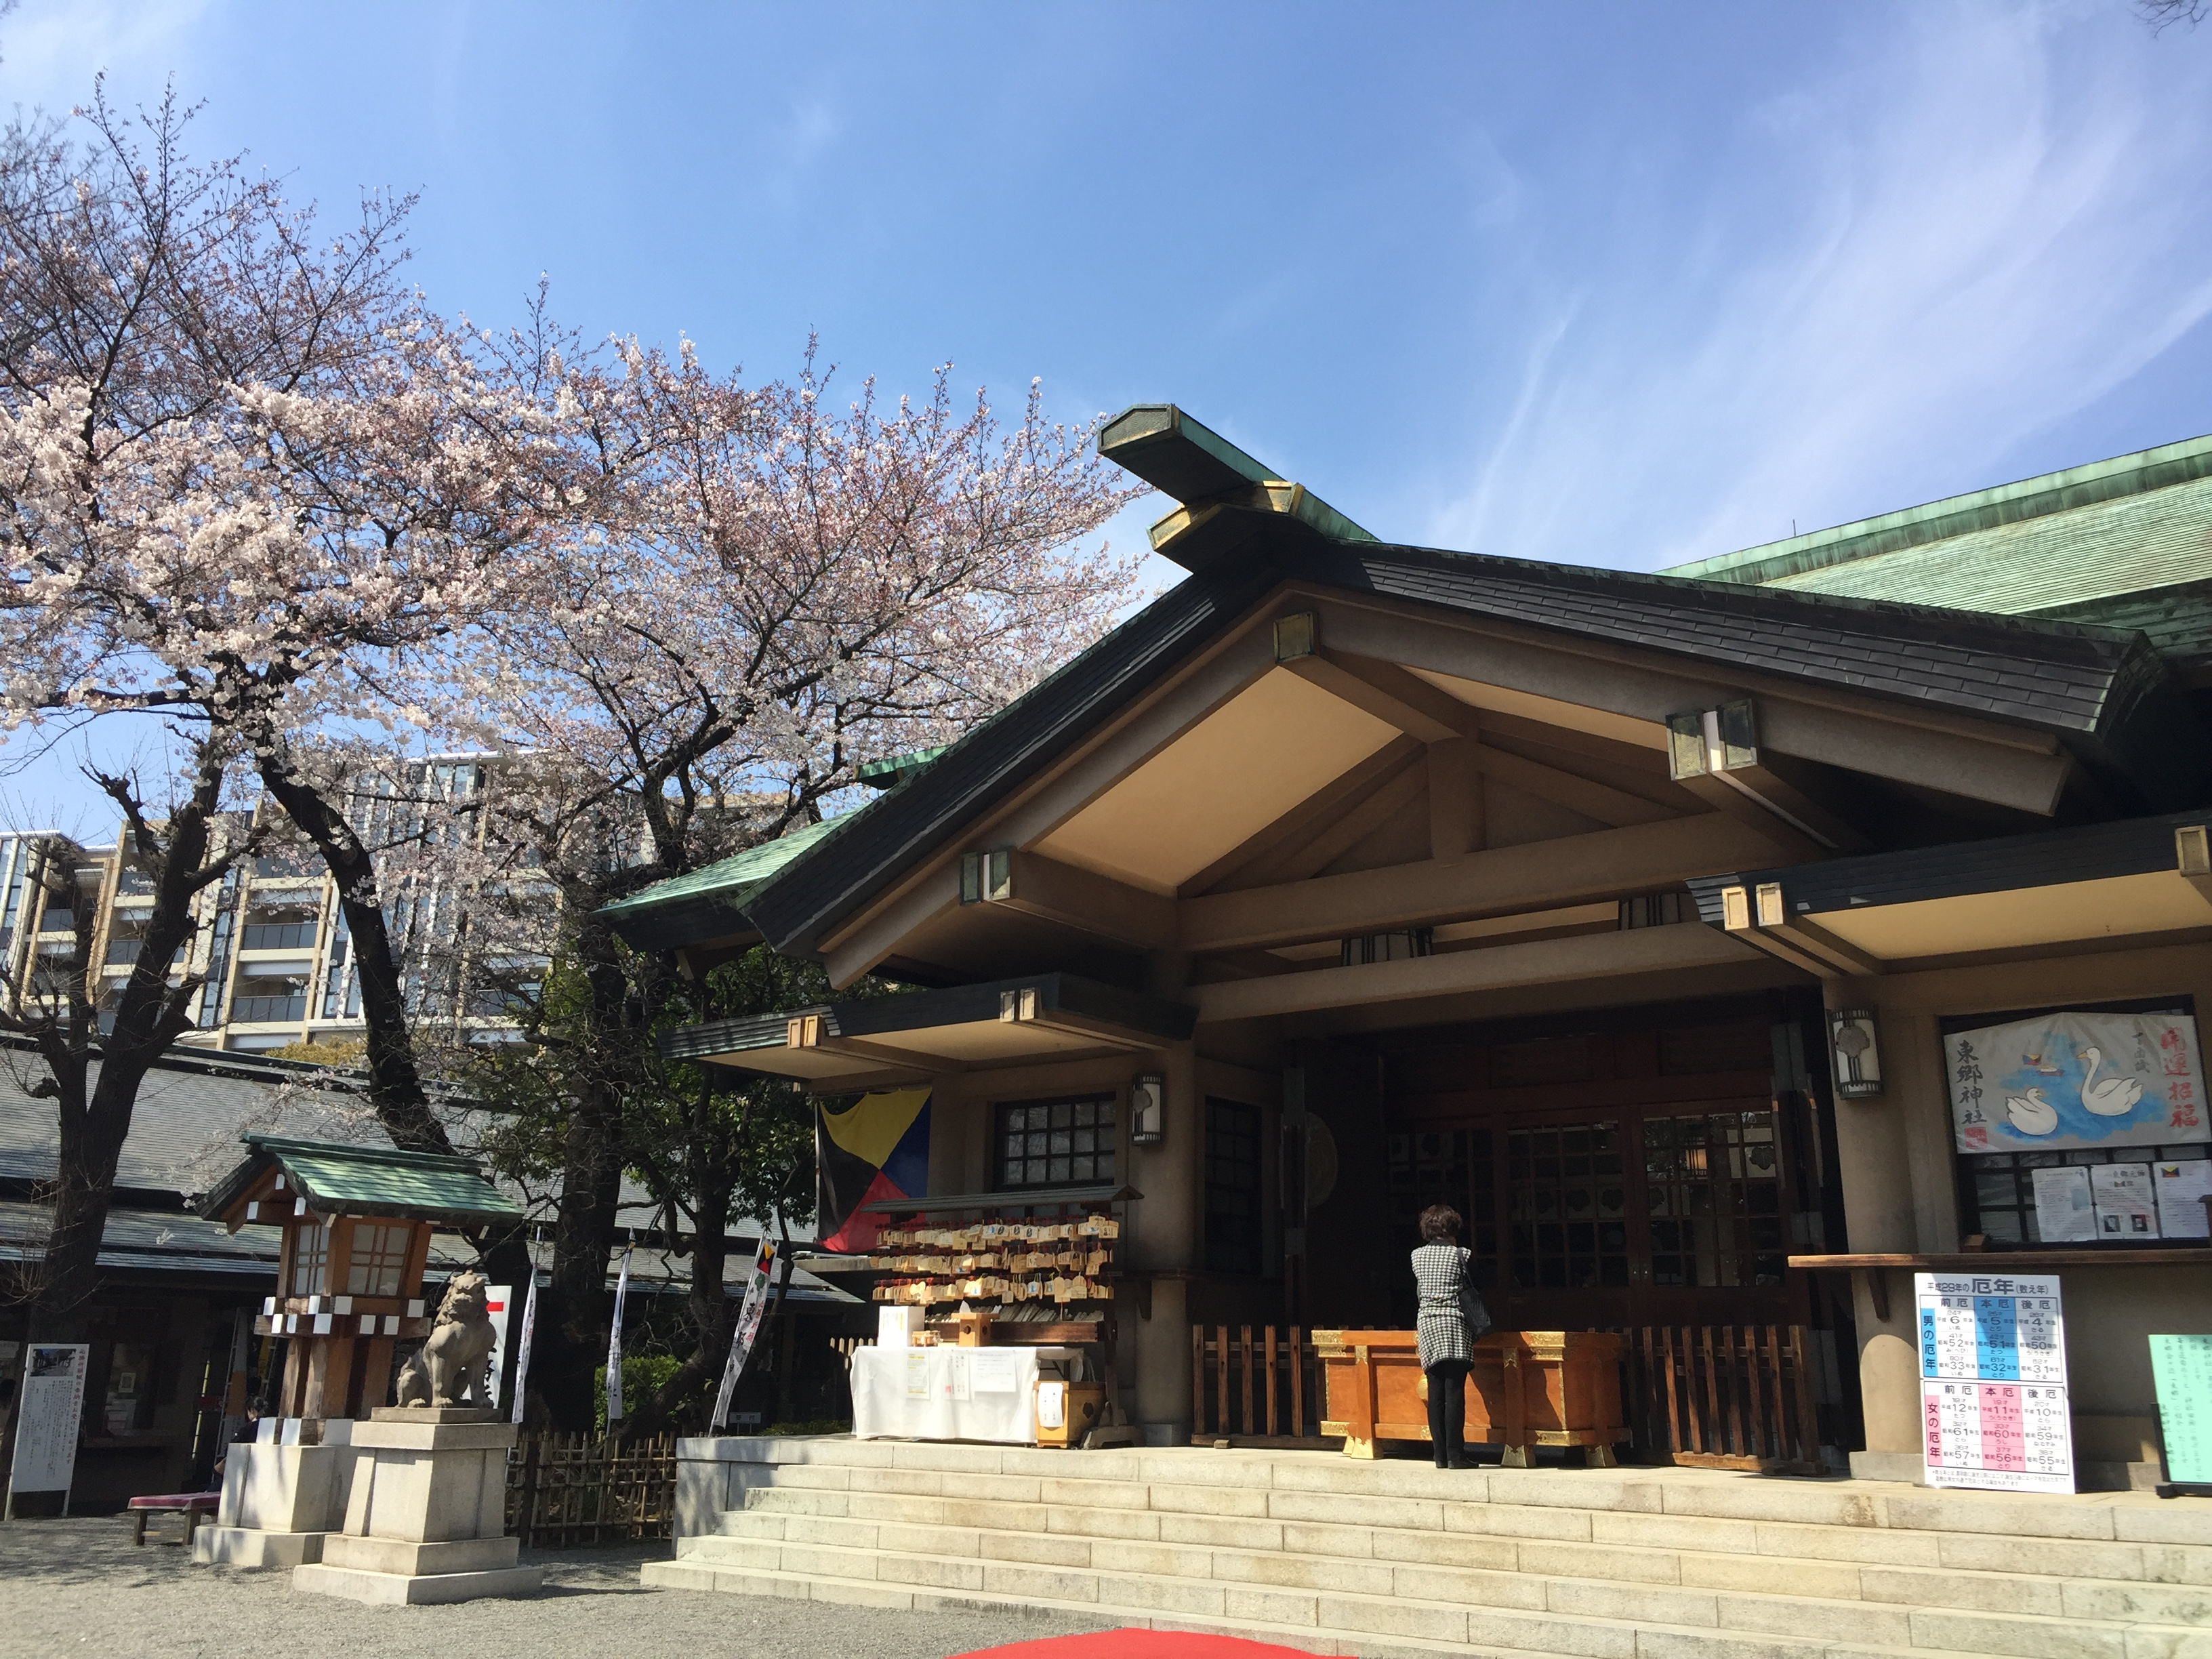 Z旗がカッコイイ原宿の『東郷神社』に参拝しました♪都心でも緑がいっぱい!